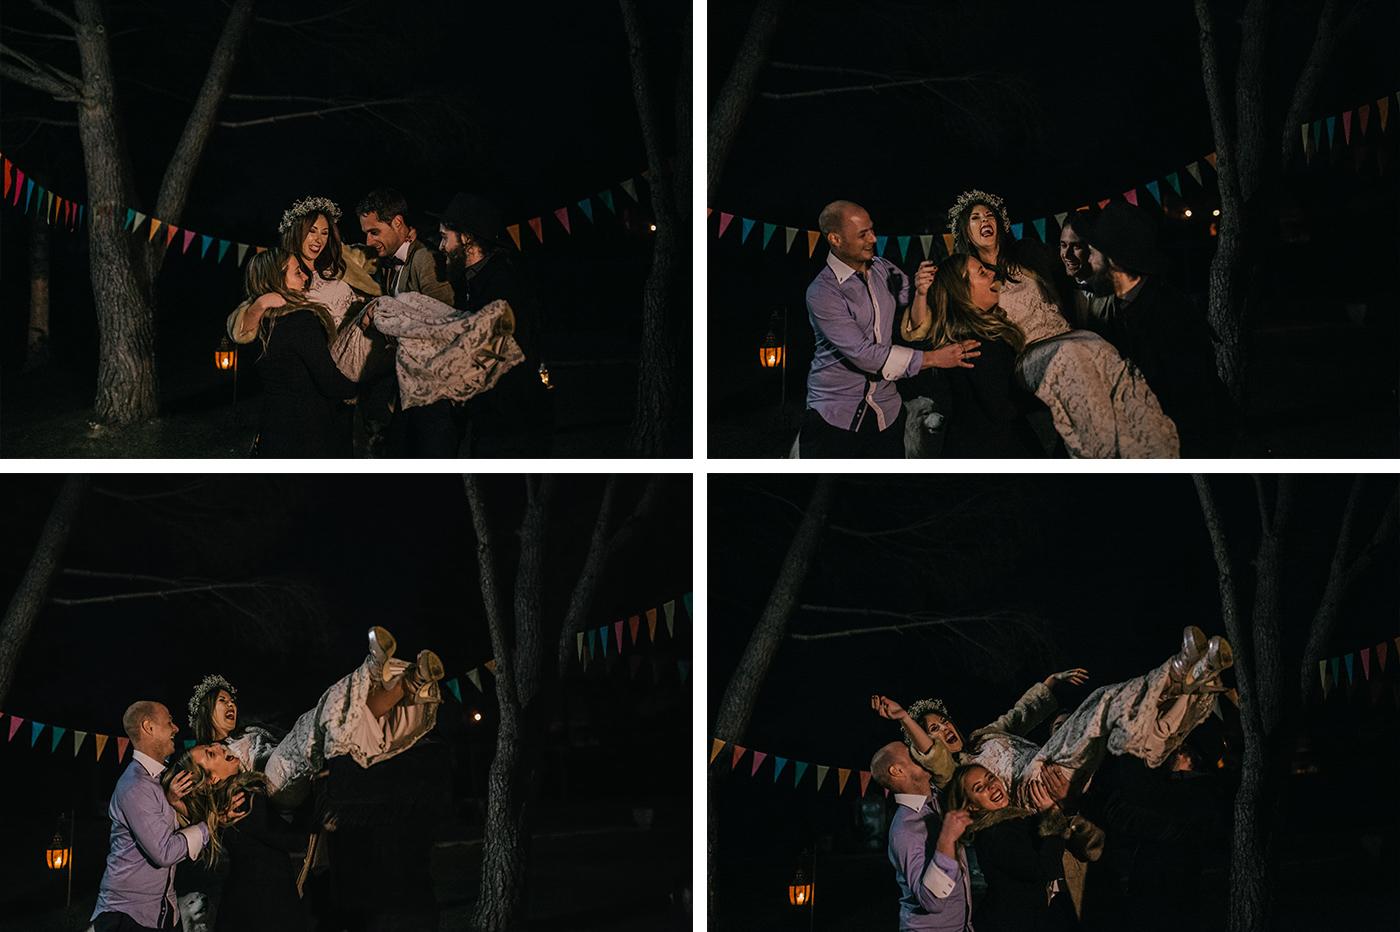 Velvet-Hush-fotografos-boda-al-aire-libre-madrid-118